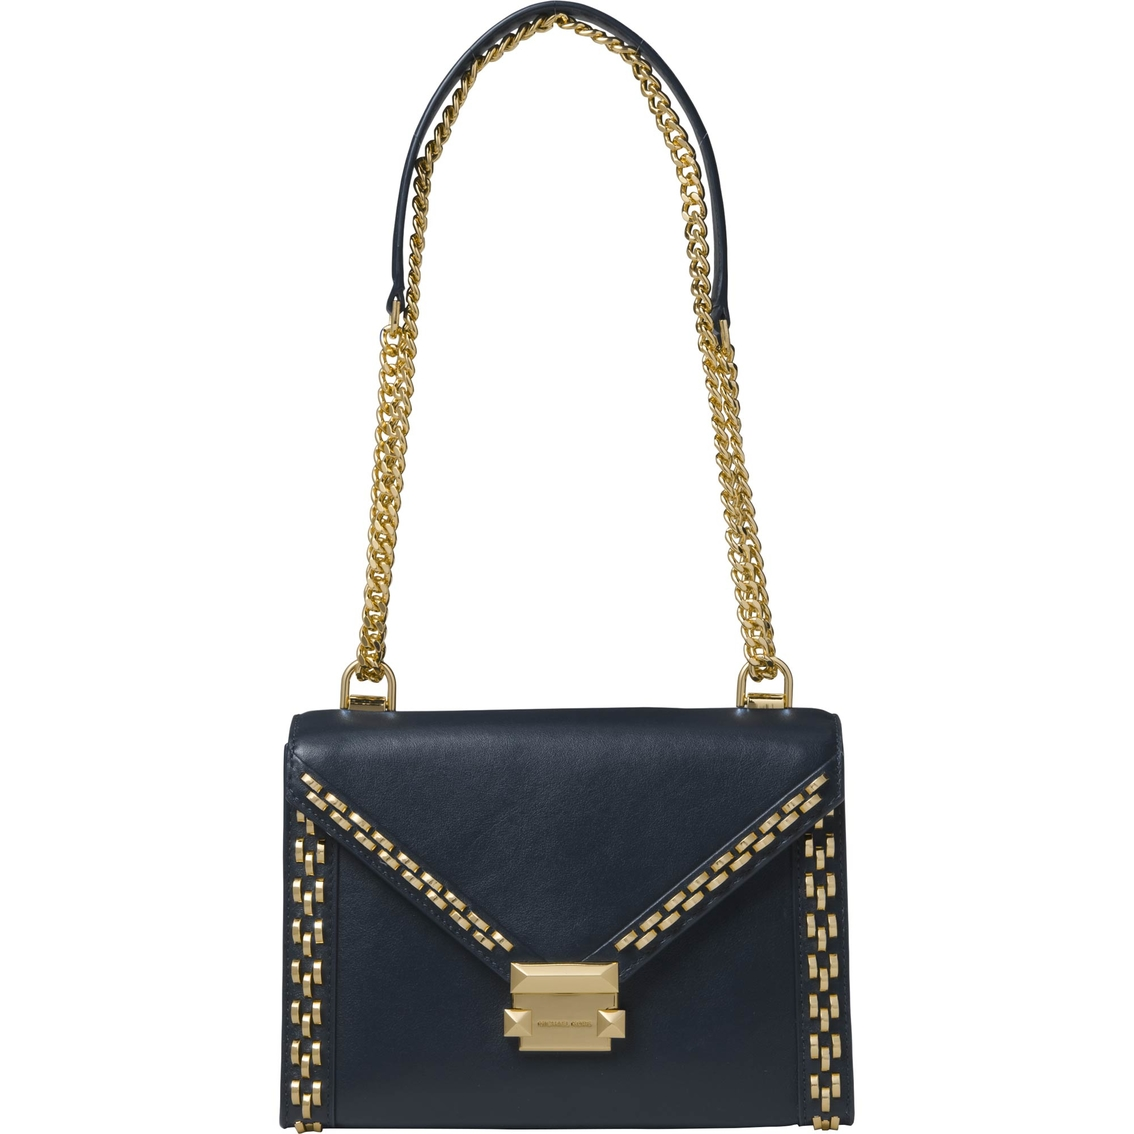 7948b8015db7 Michael Kors Whitney Leather Large Shoulder Bag | Handbags | Shop ...